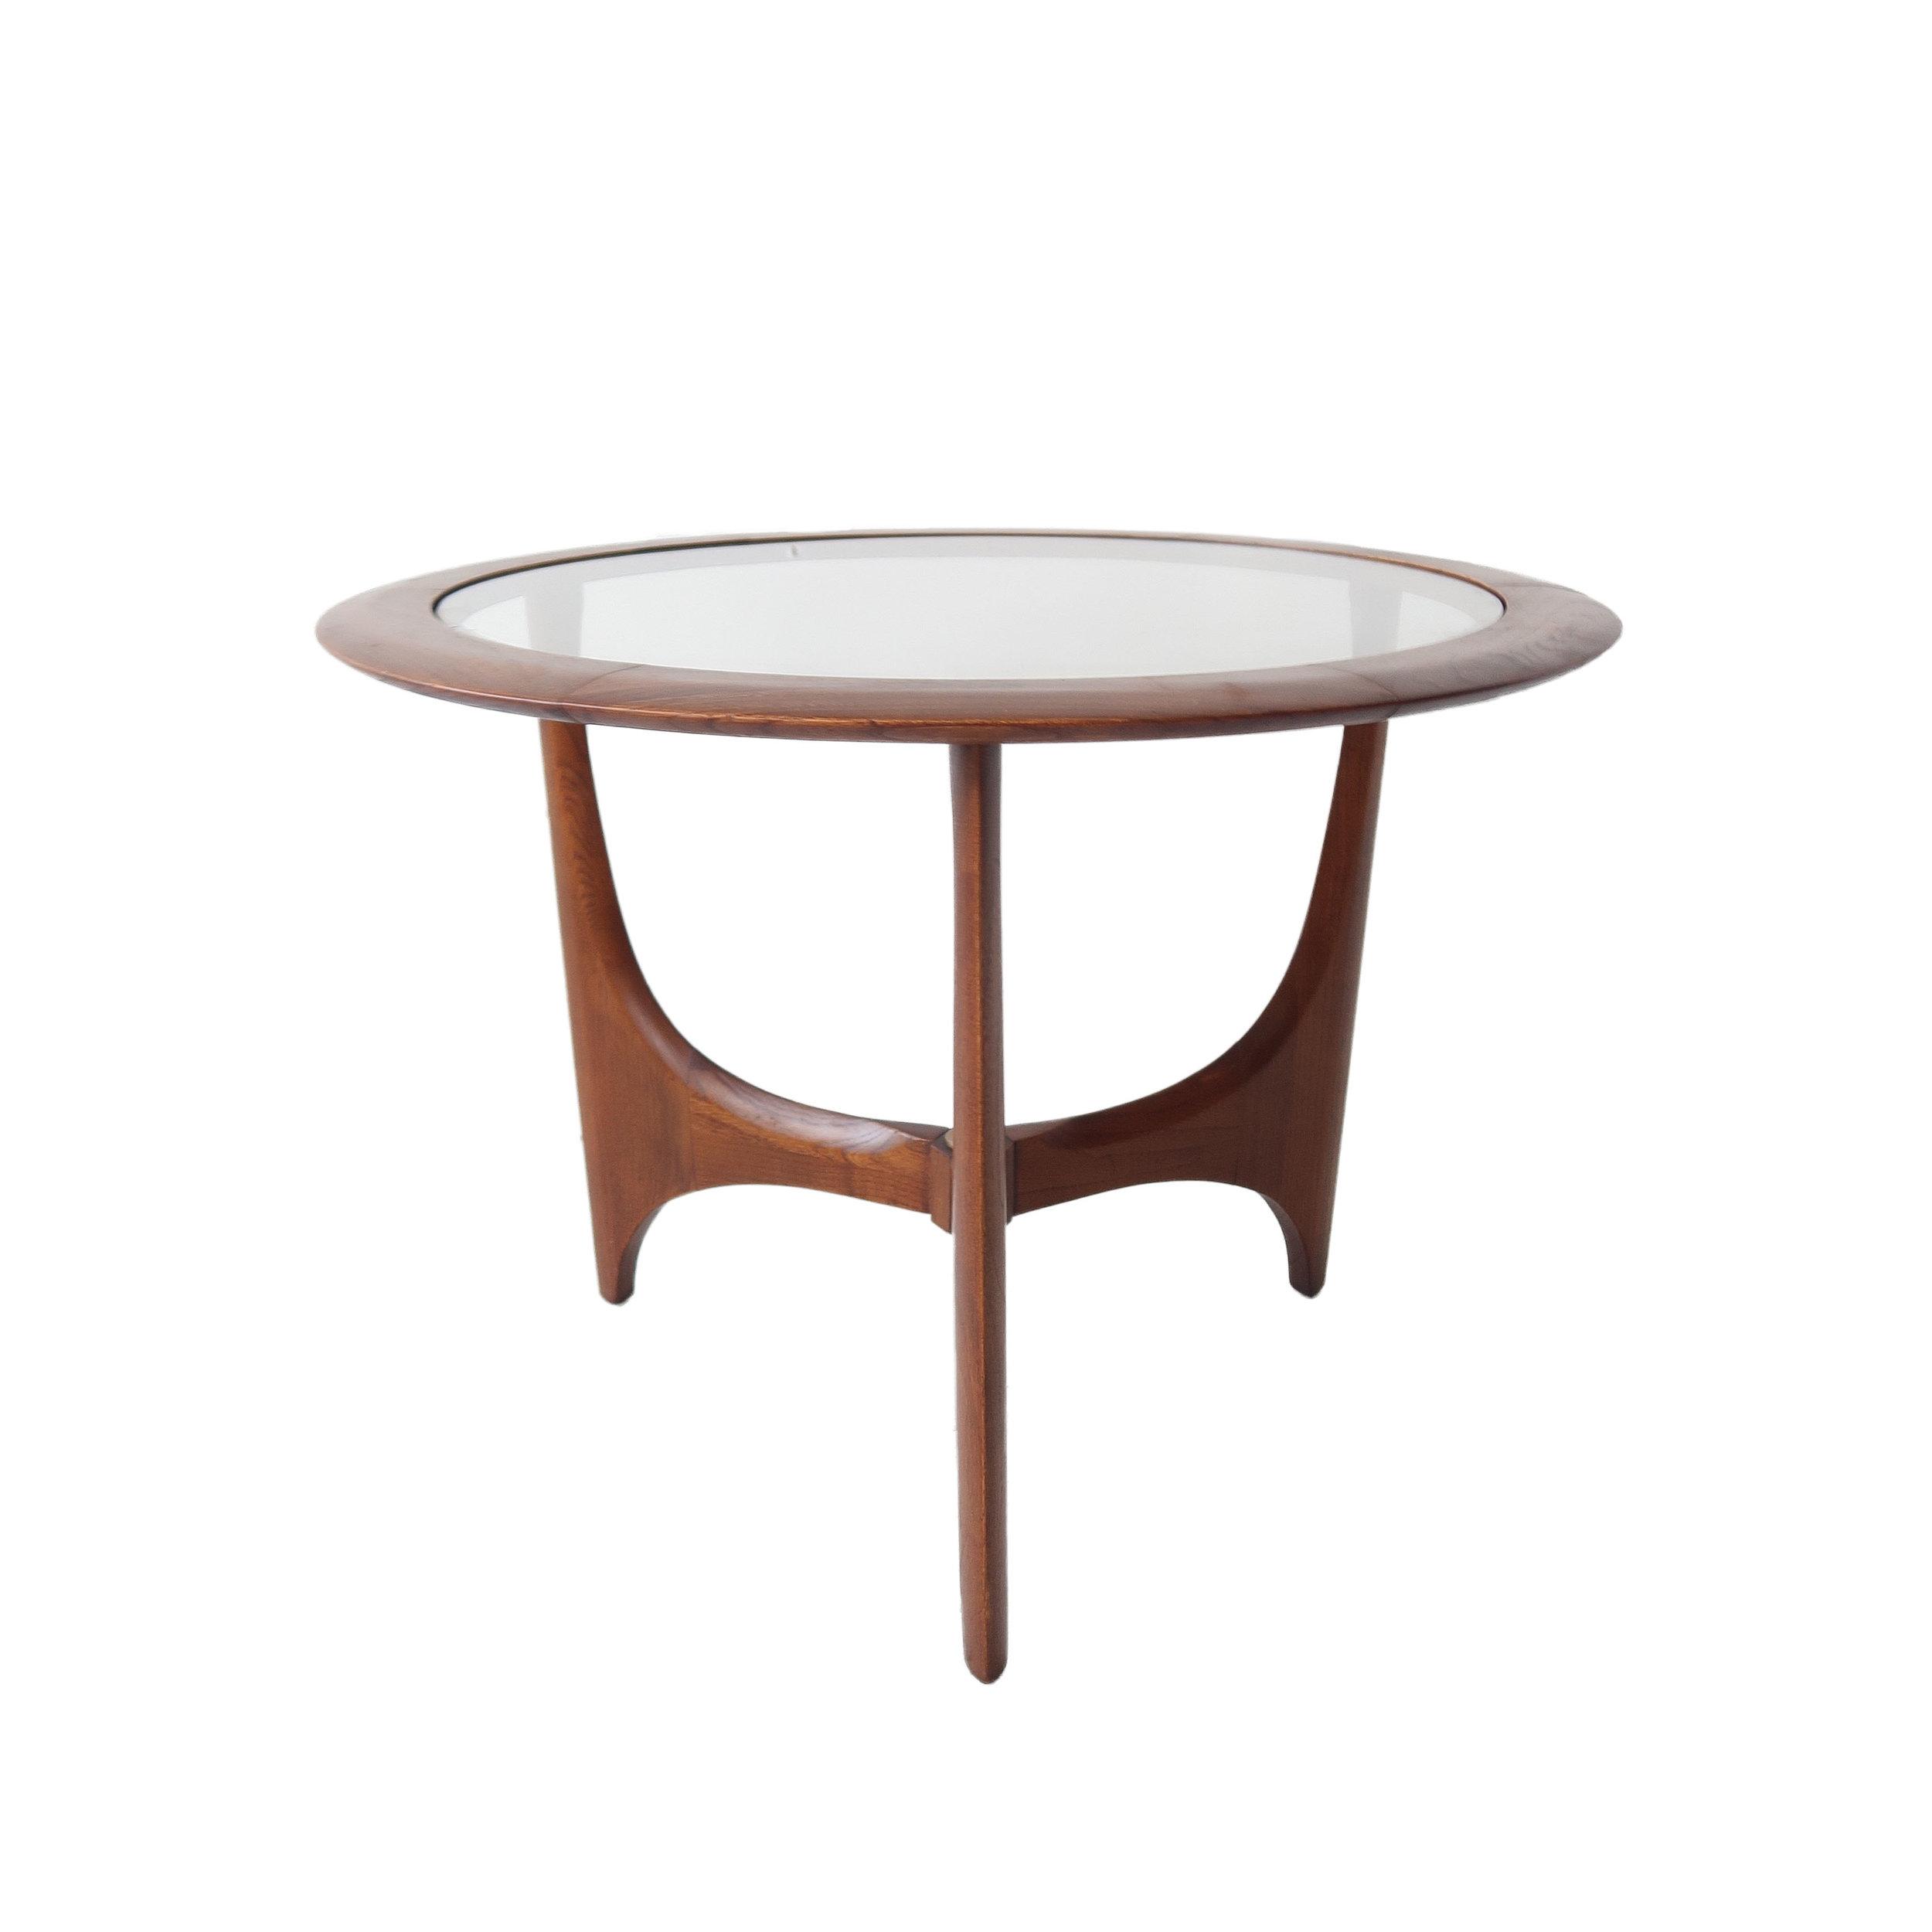 vintage lane wood and glass table.jpg